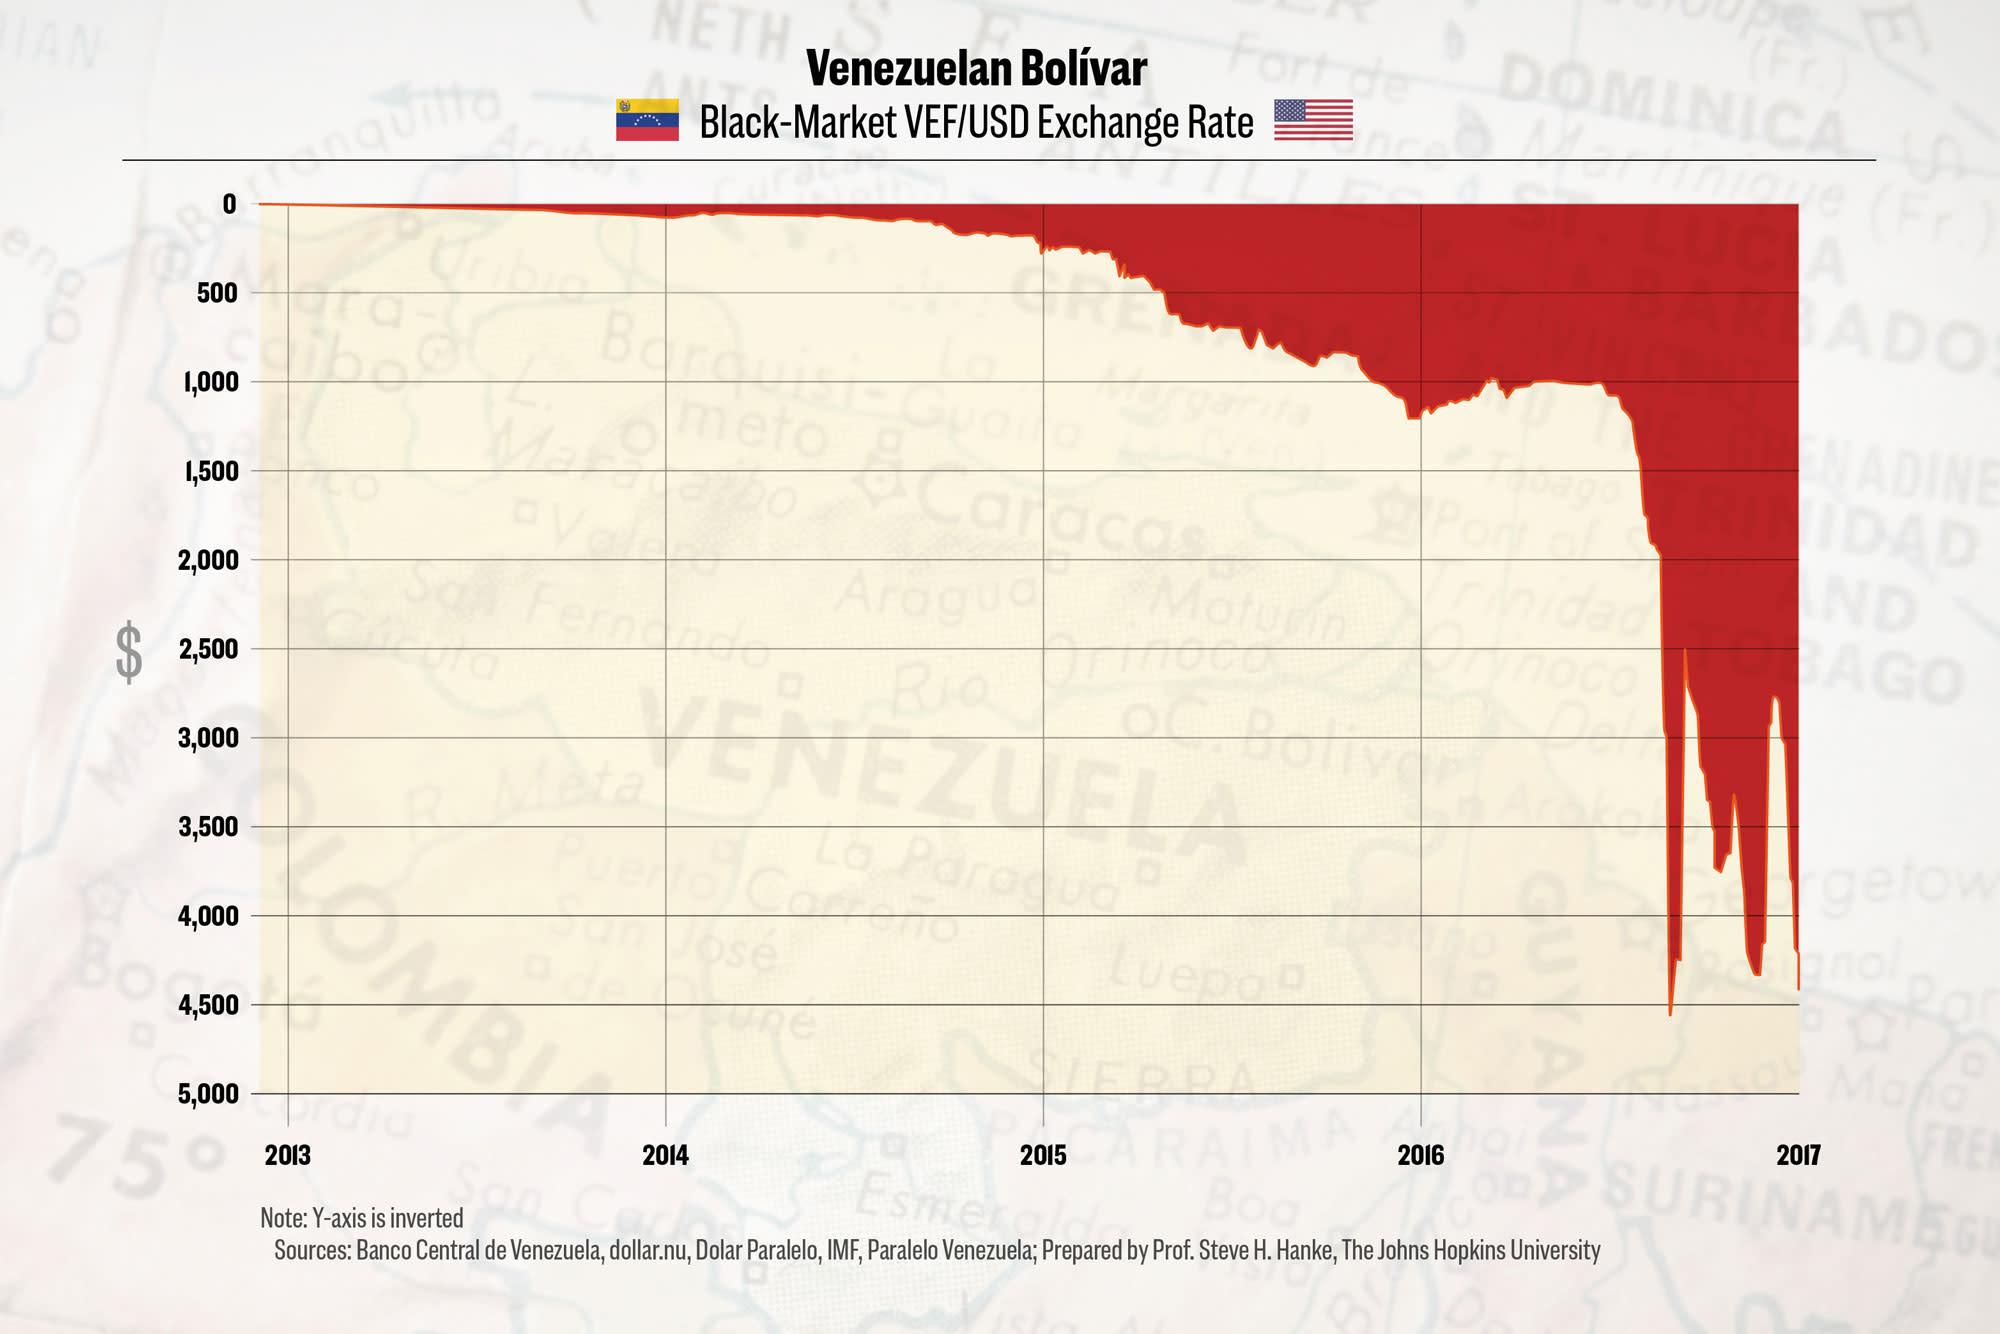 ONE TIME USE: Venezuelan Bolivar chart